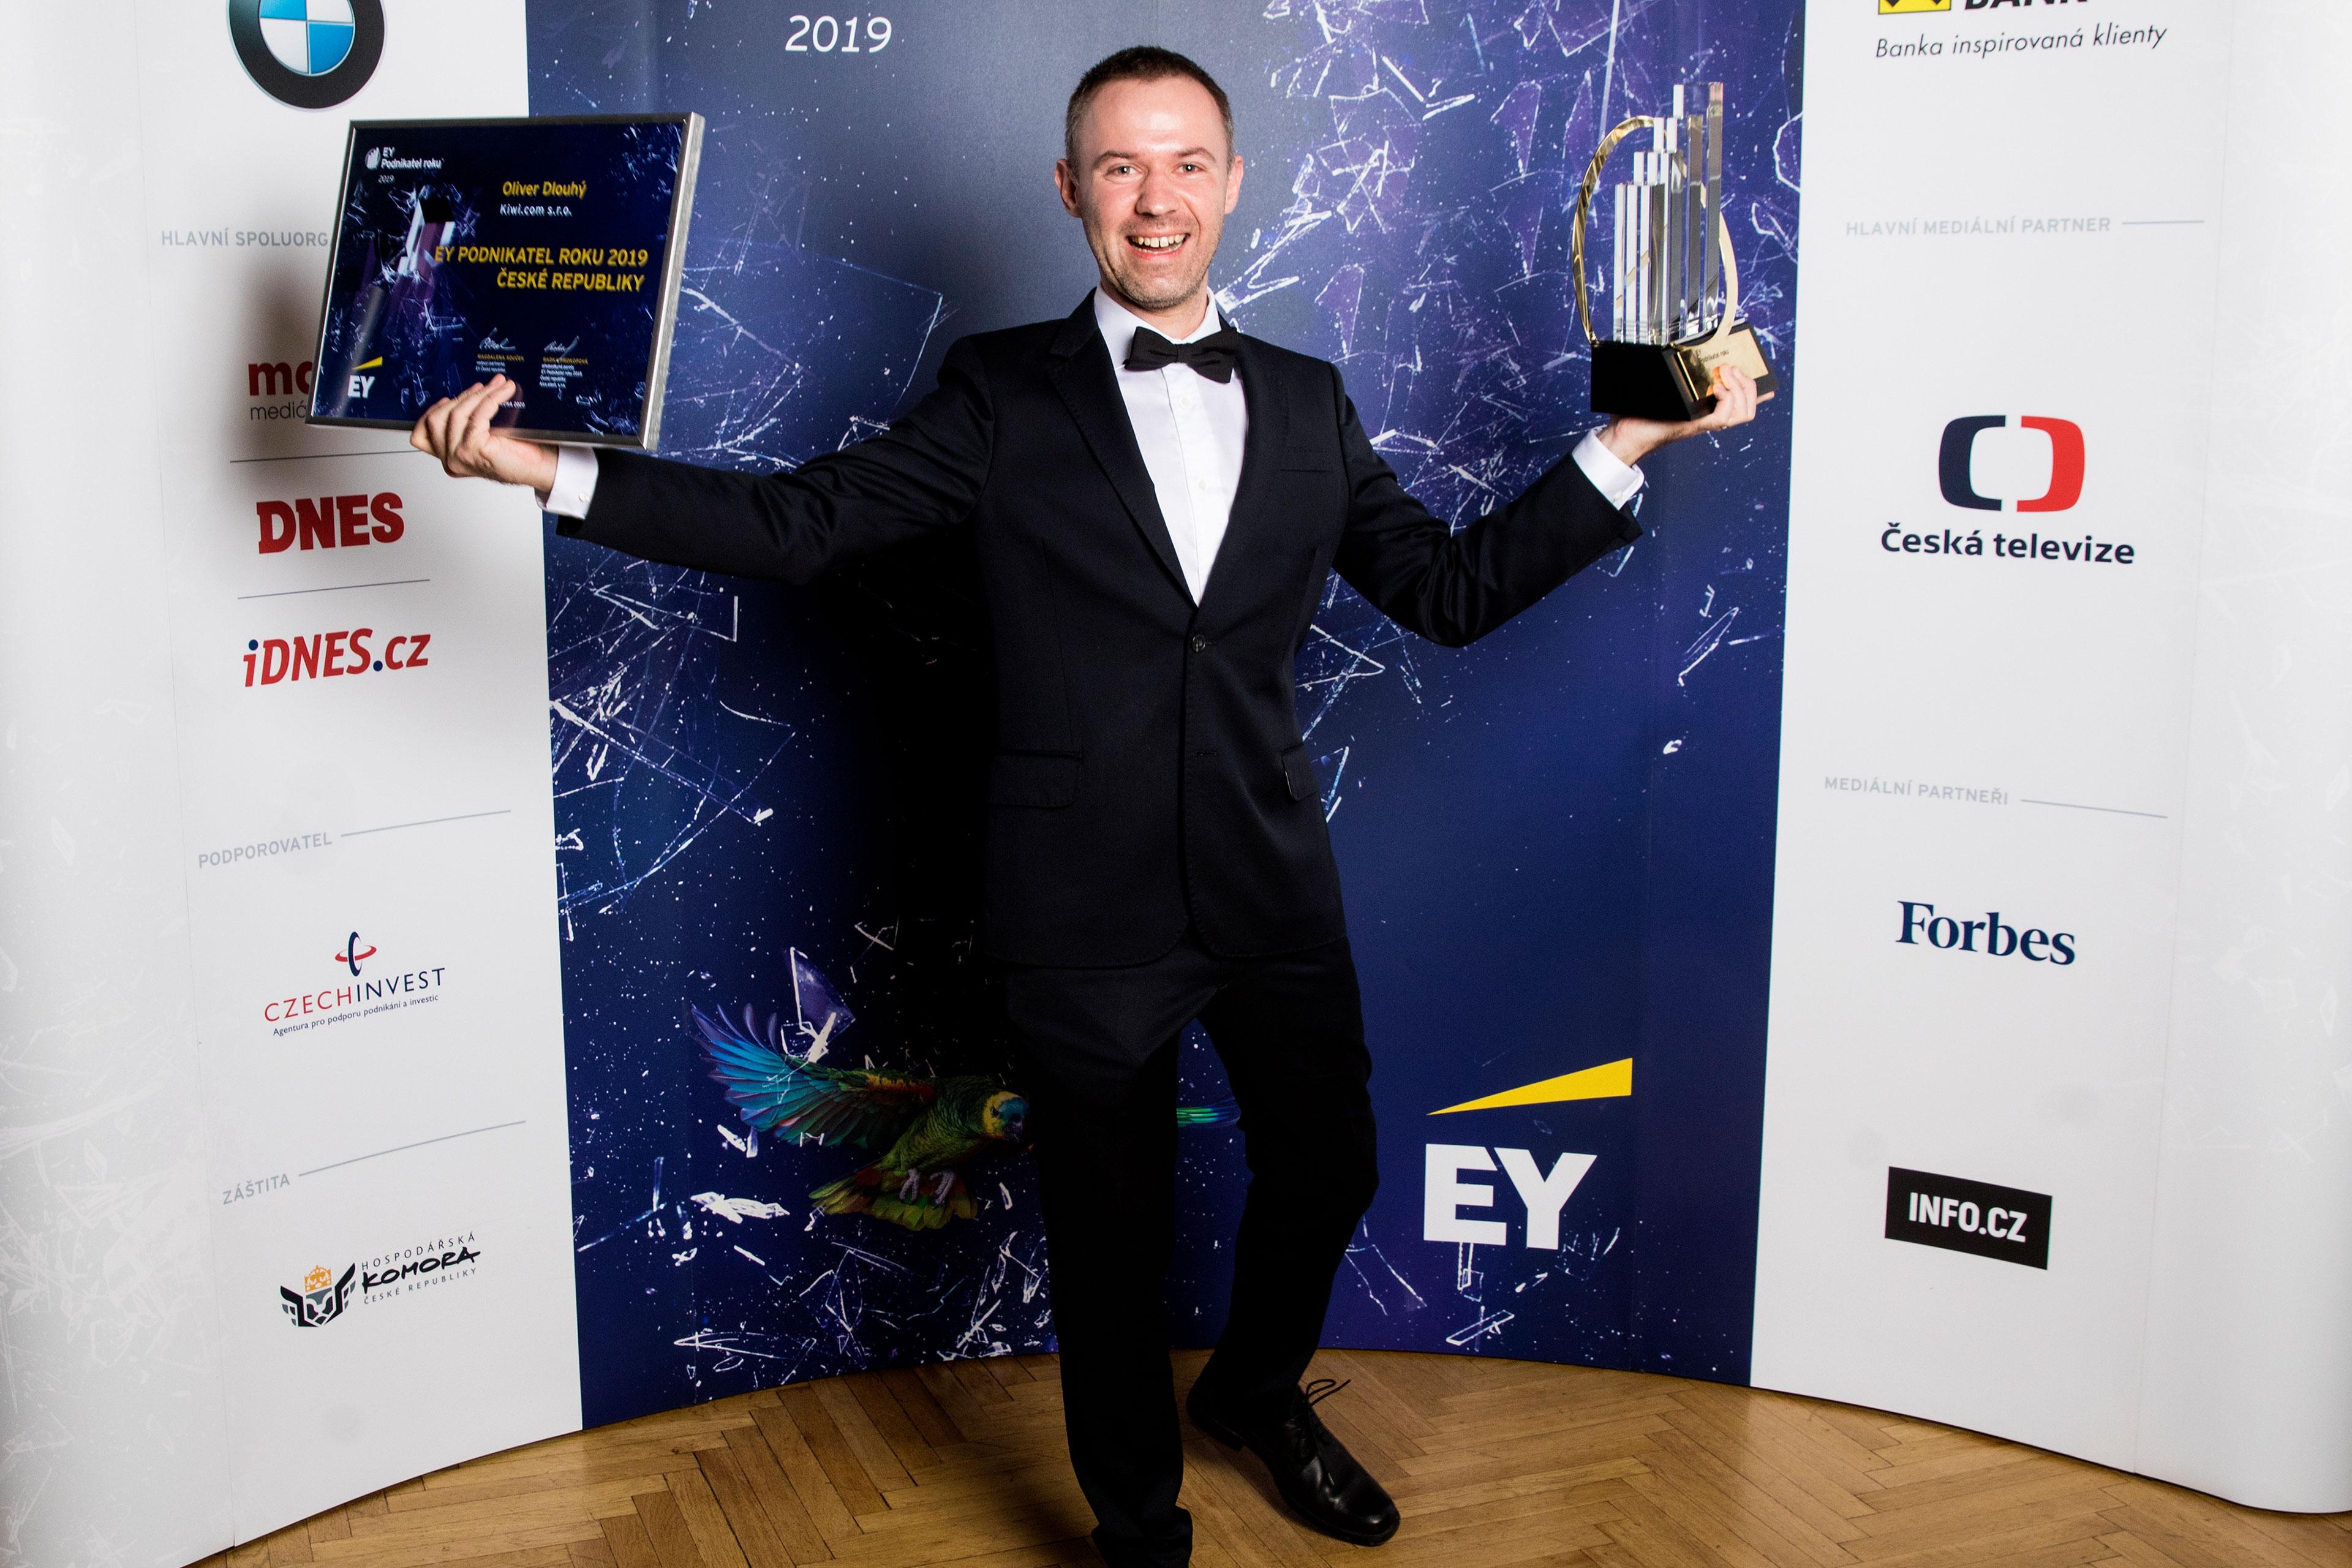 ey-foto-1-podnikatelem-roku-2019-eske-republiky-je-oliver-dlouhy-zakladatel-globalniho-start-upu-kiwi-com-sro